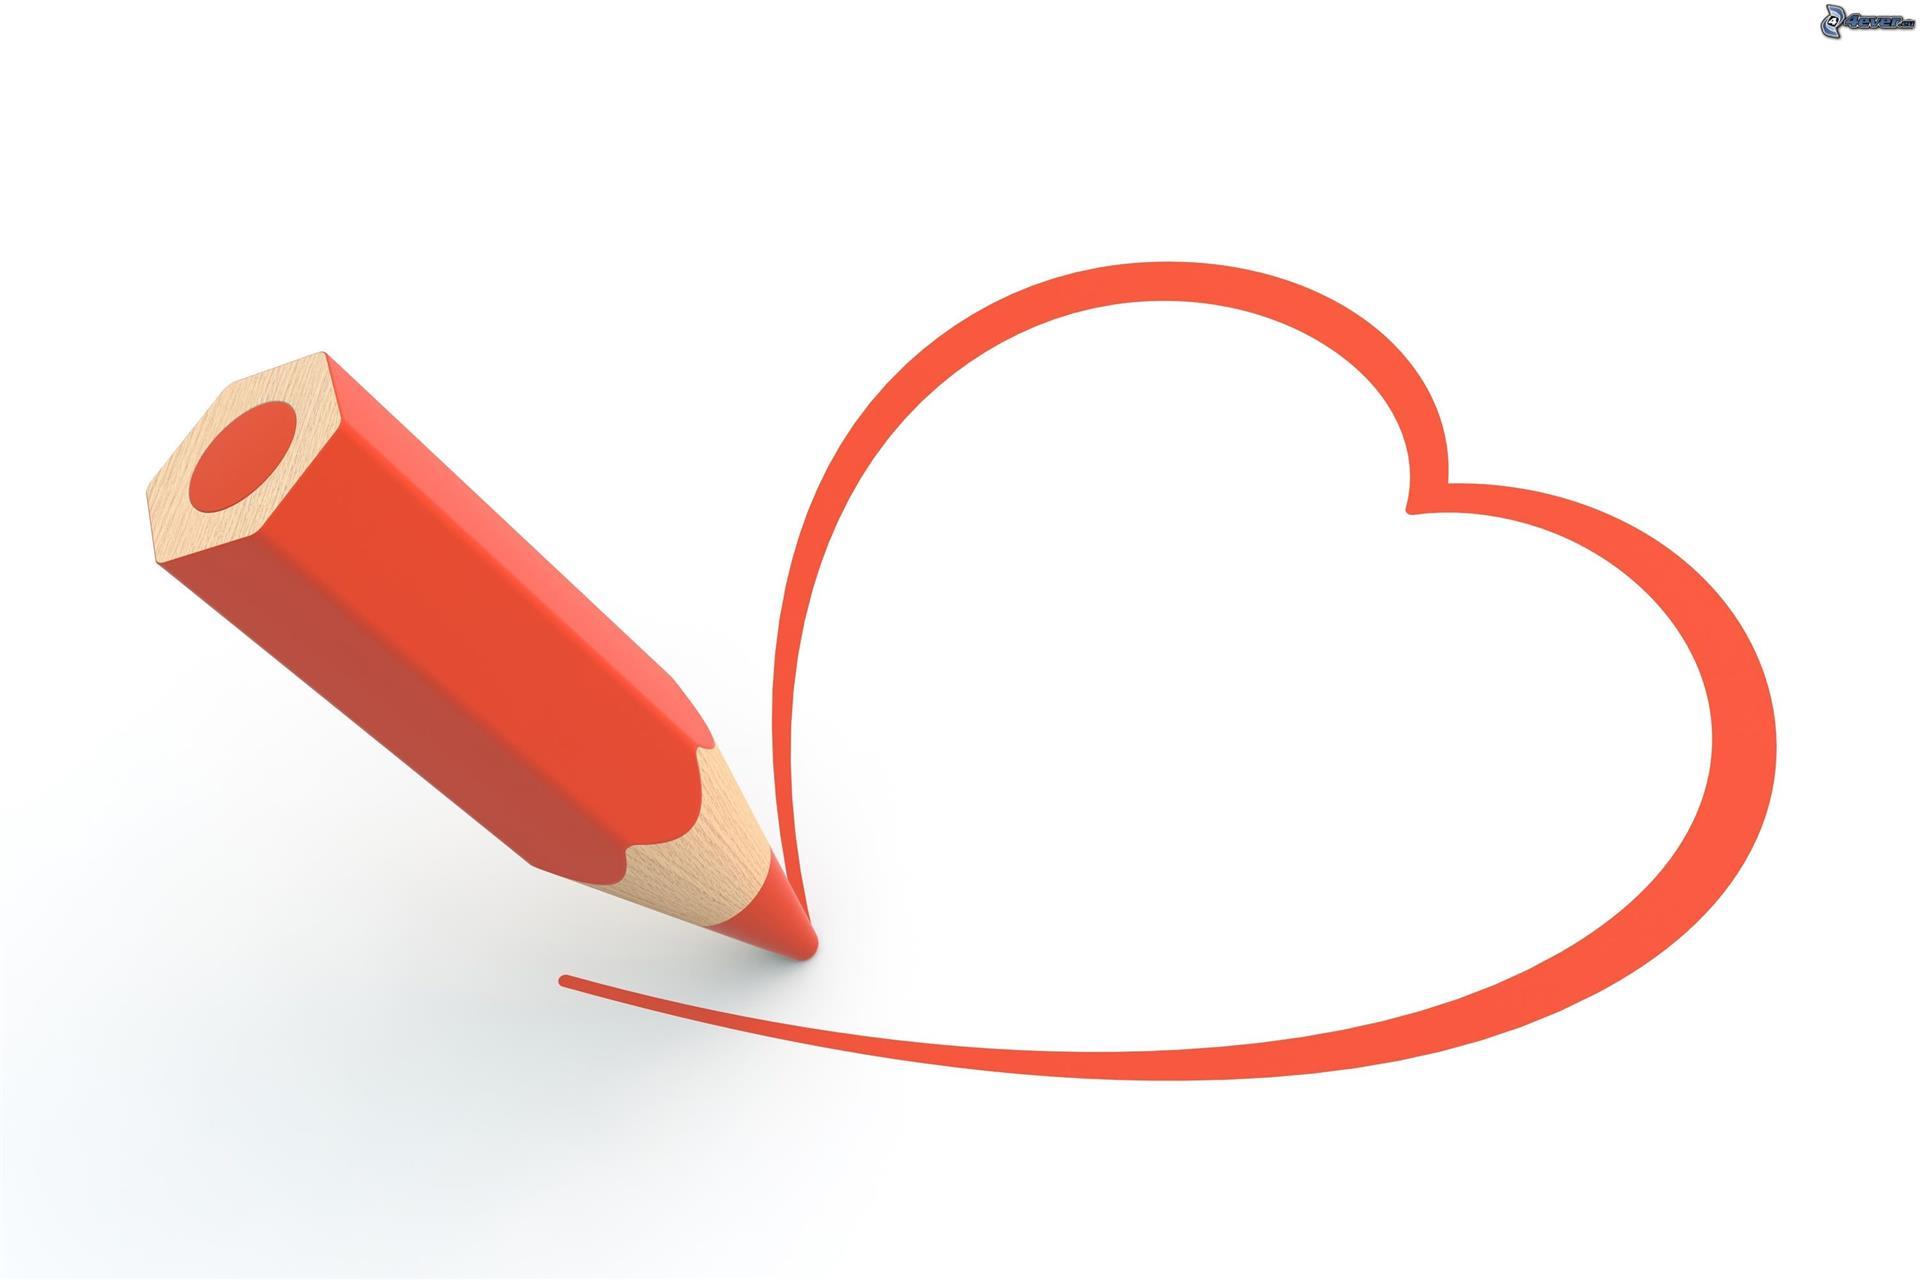 [images.4ever.eu] coeur rouge, crayon 168870 - FOTOLIA